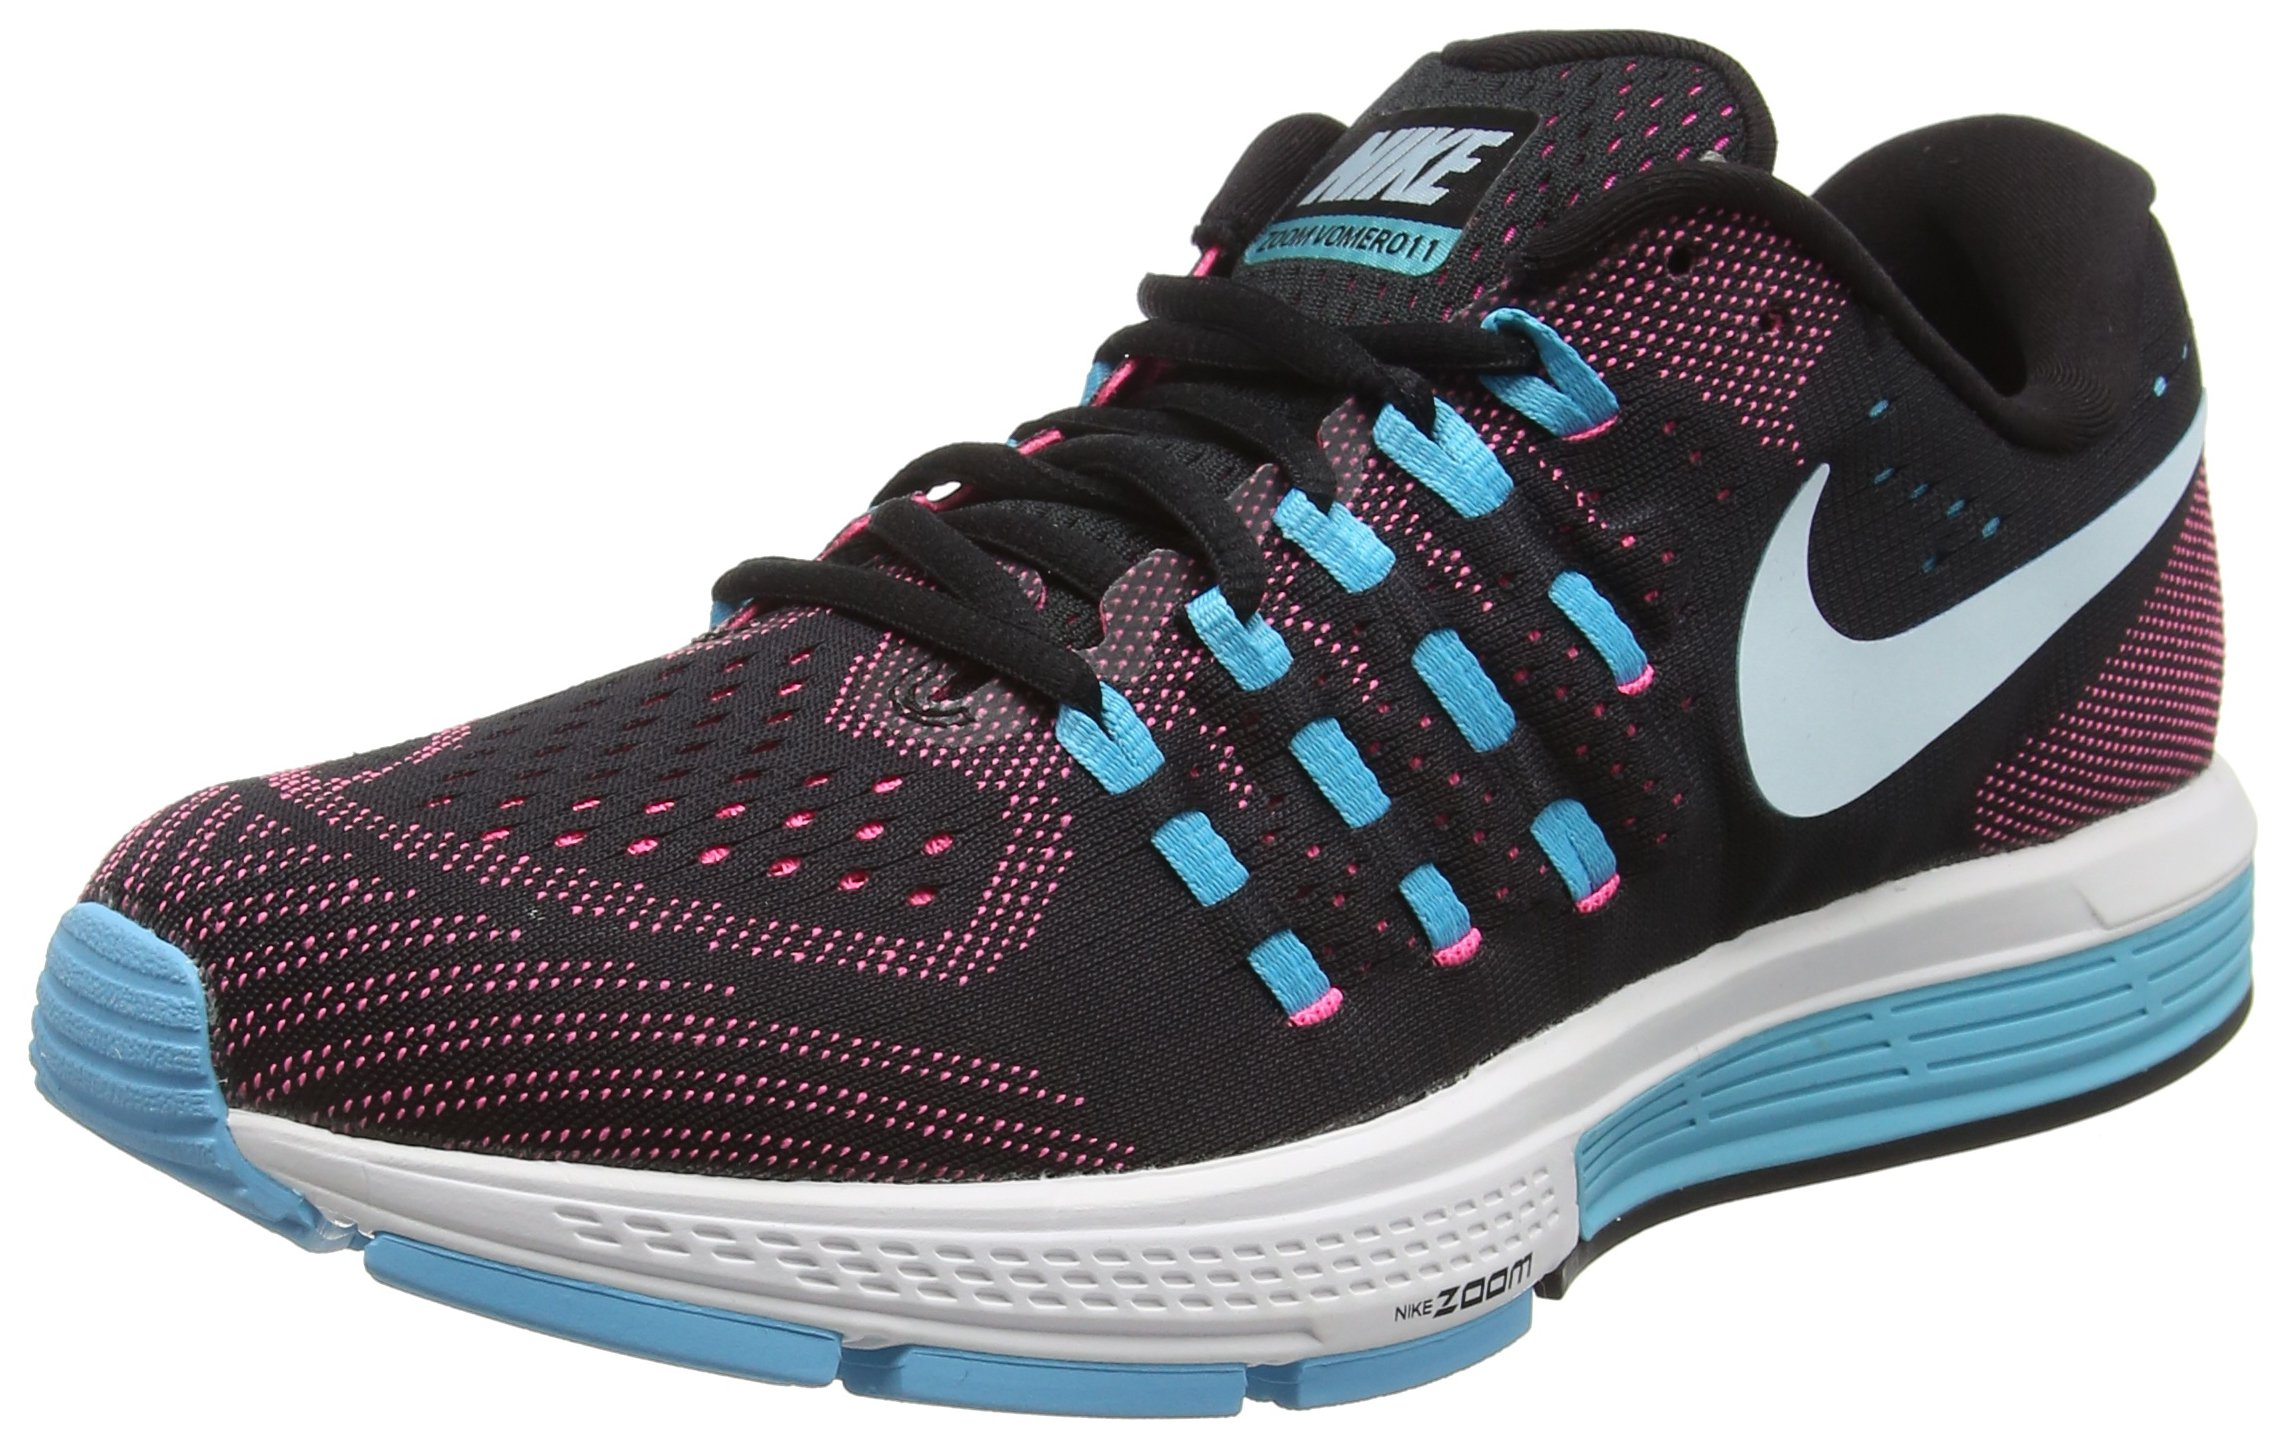 5593cba4d2c5 Nike Womens Air Zoom Vomero 11 Black Glcr Bl Pnk Blst Gmm Bl Running ...